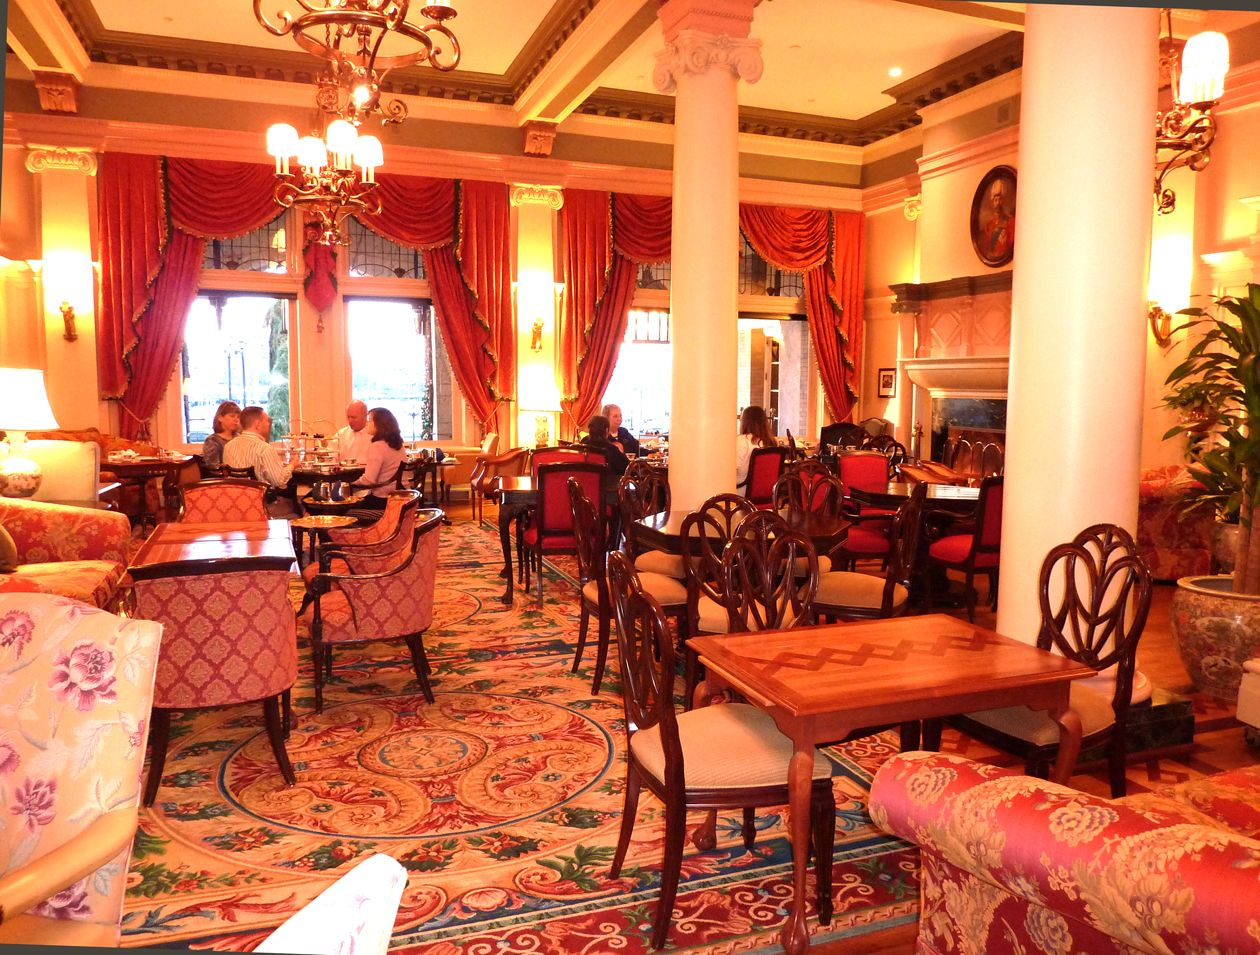 Tea Time At The Empress Empress Hotel Fairmont Empress Hotel Tea Room